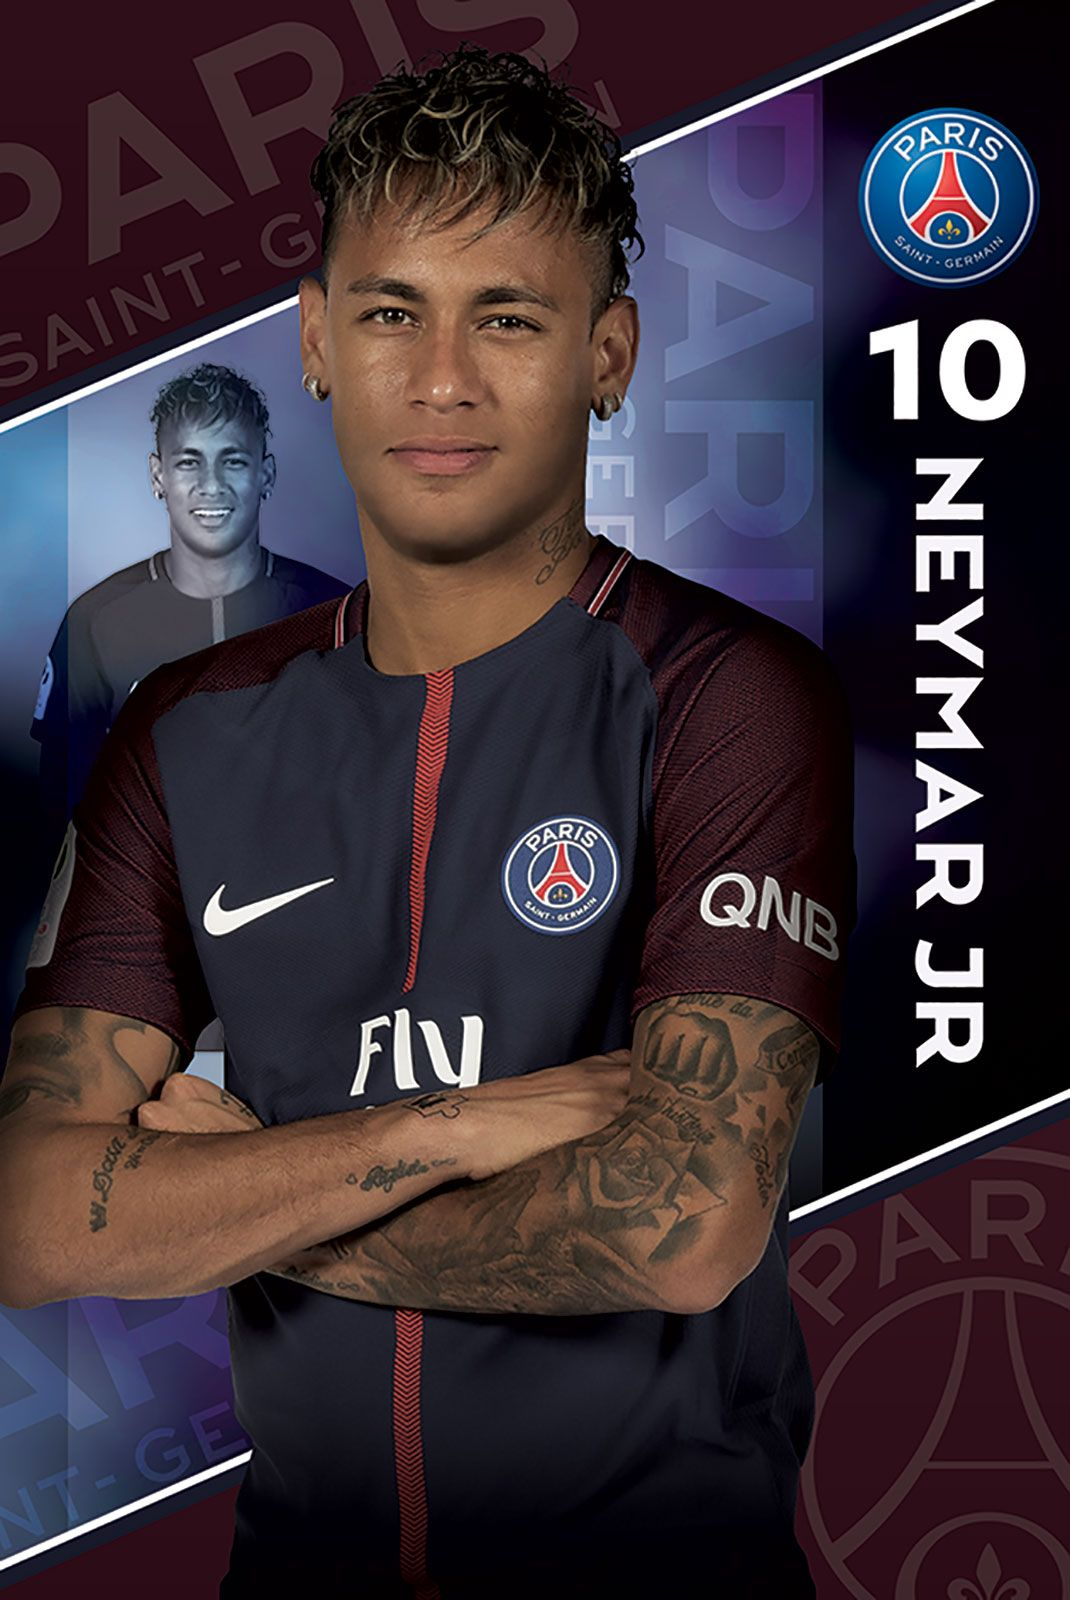 PSG (Neymar 17/18) - plakat